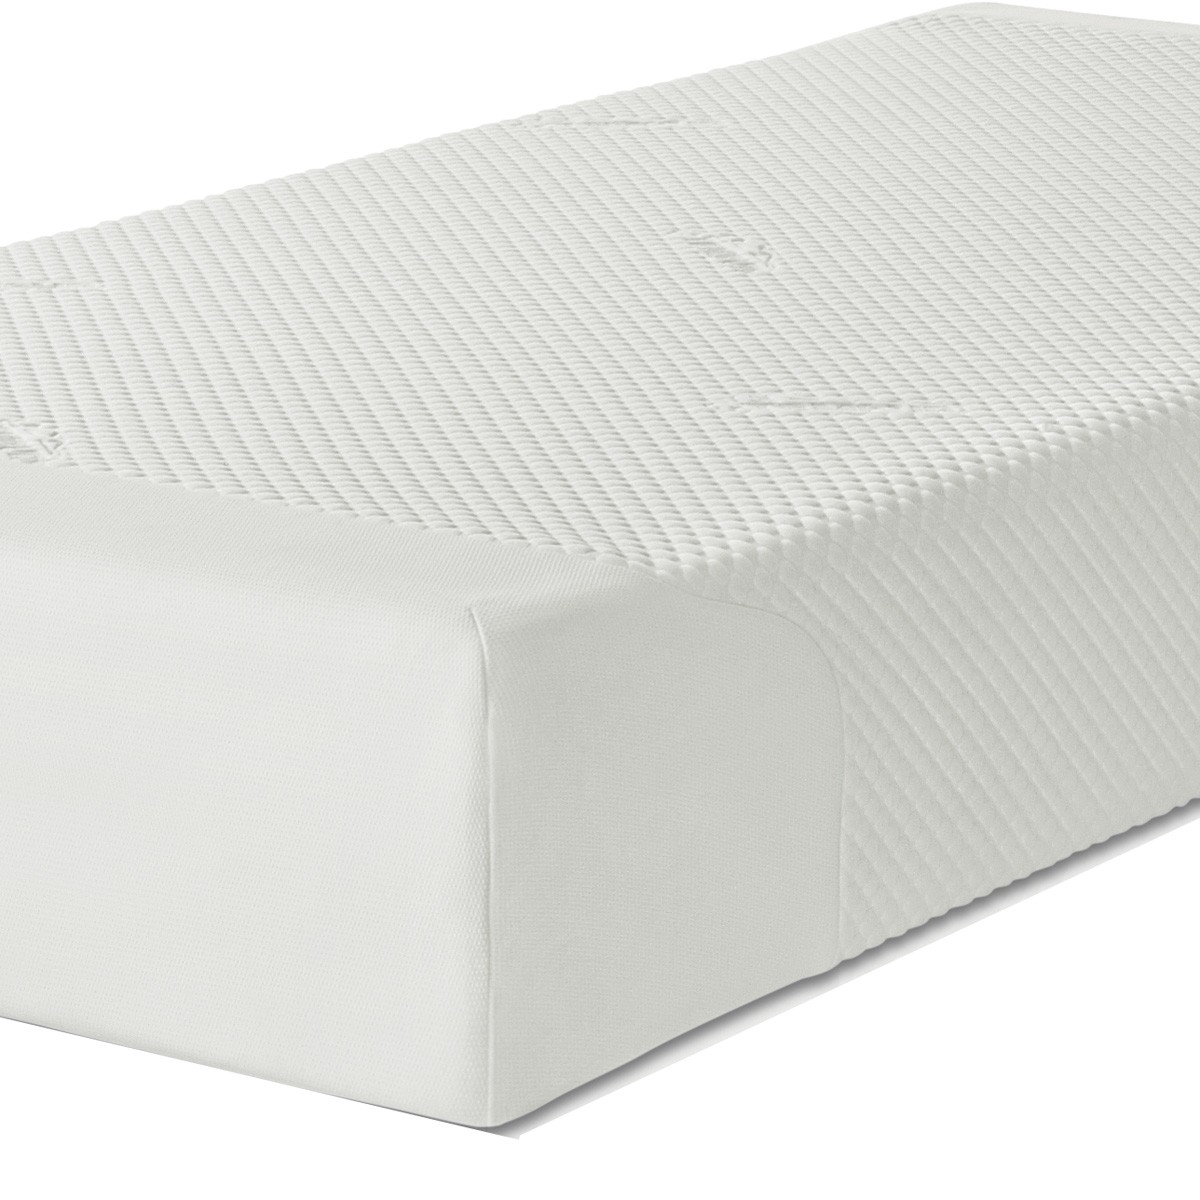 cloud mattress 25 cm tempur tempur mattresses. Black Bedroom Furniture Sets. Home Design Ideas